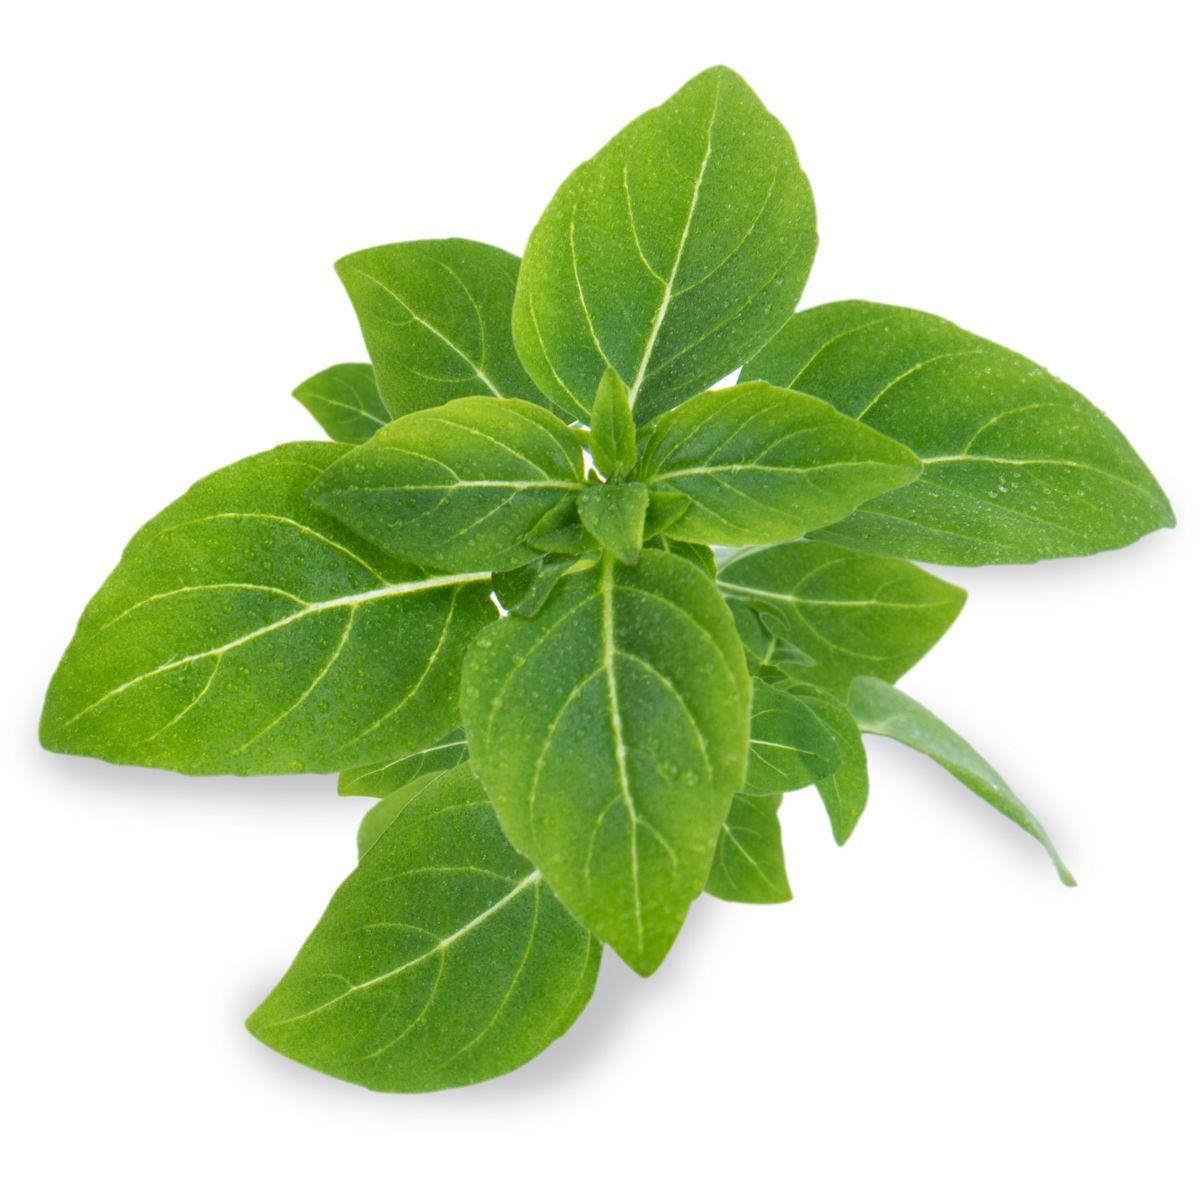 Recharge jardin intérieur VERITABLE Basilic fin vert nain BIO